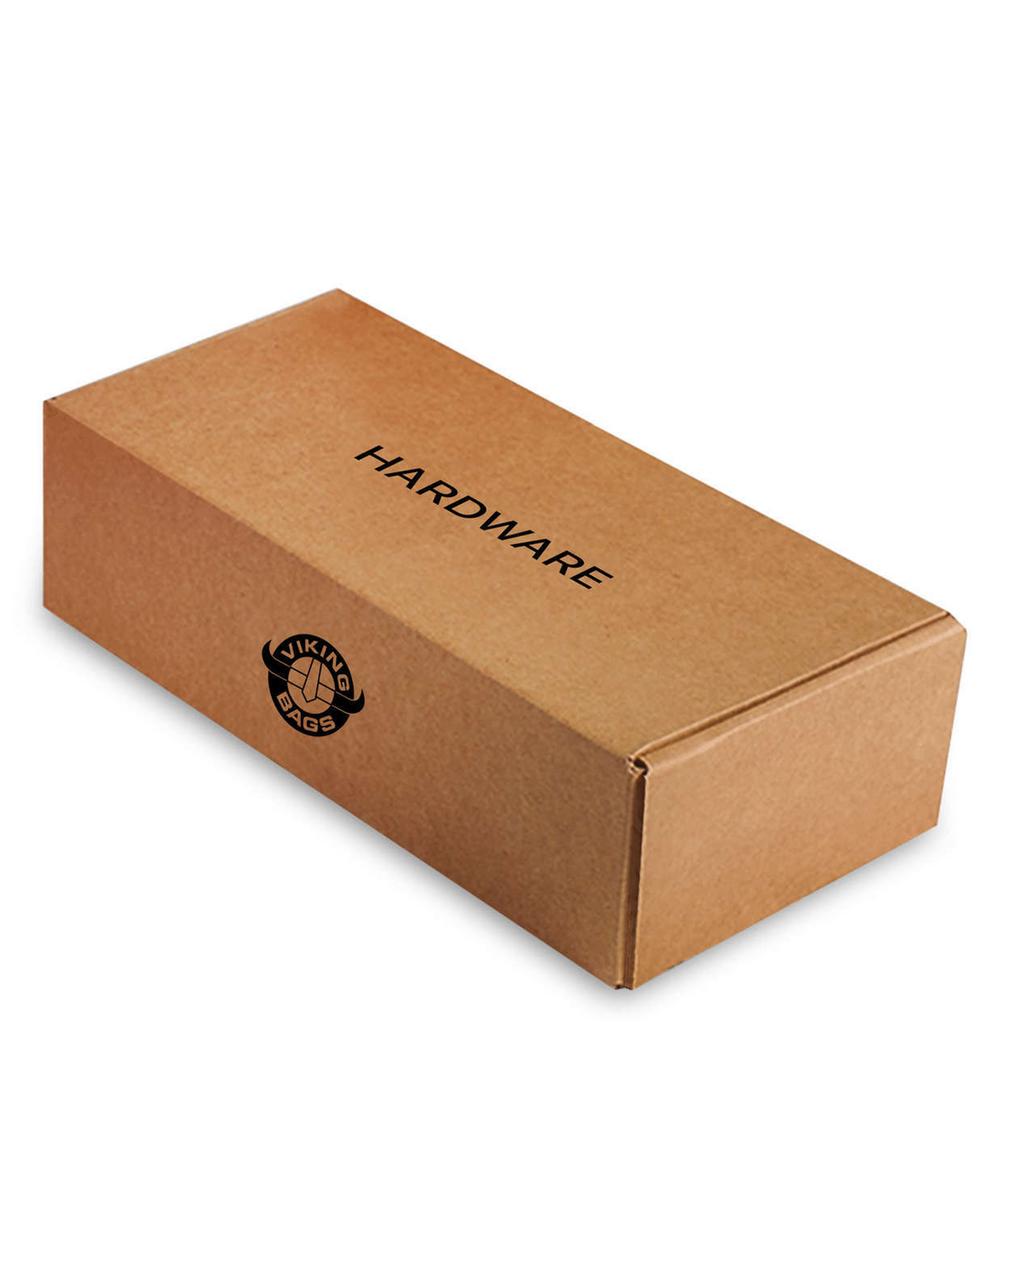 Honda 1100 Shadow Sabre Viking Lamellar Slanted Leather Covered Motorcycle Hard Saddlebags box